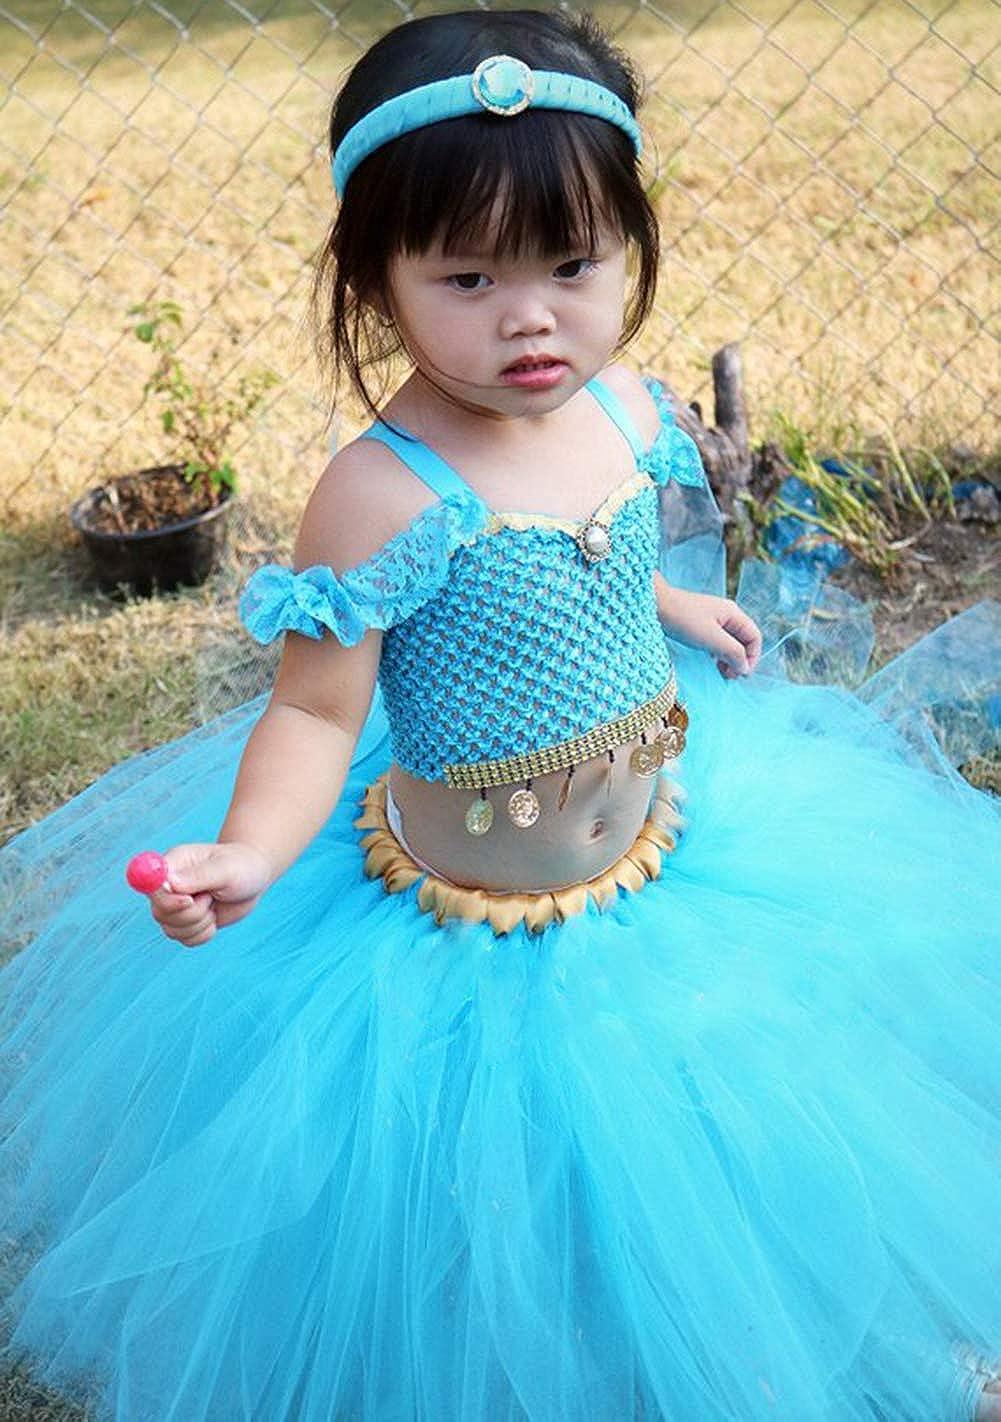 Tutu Dreams 3pcs Princess Costume Dress for Girls 1-12Y Birthday Halloween Party